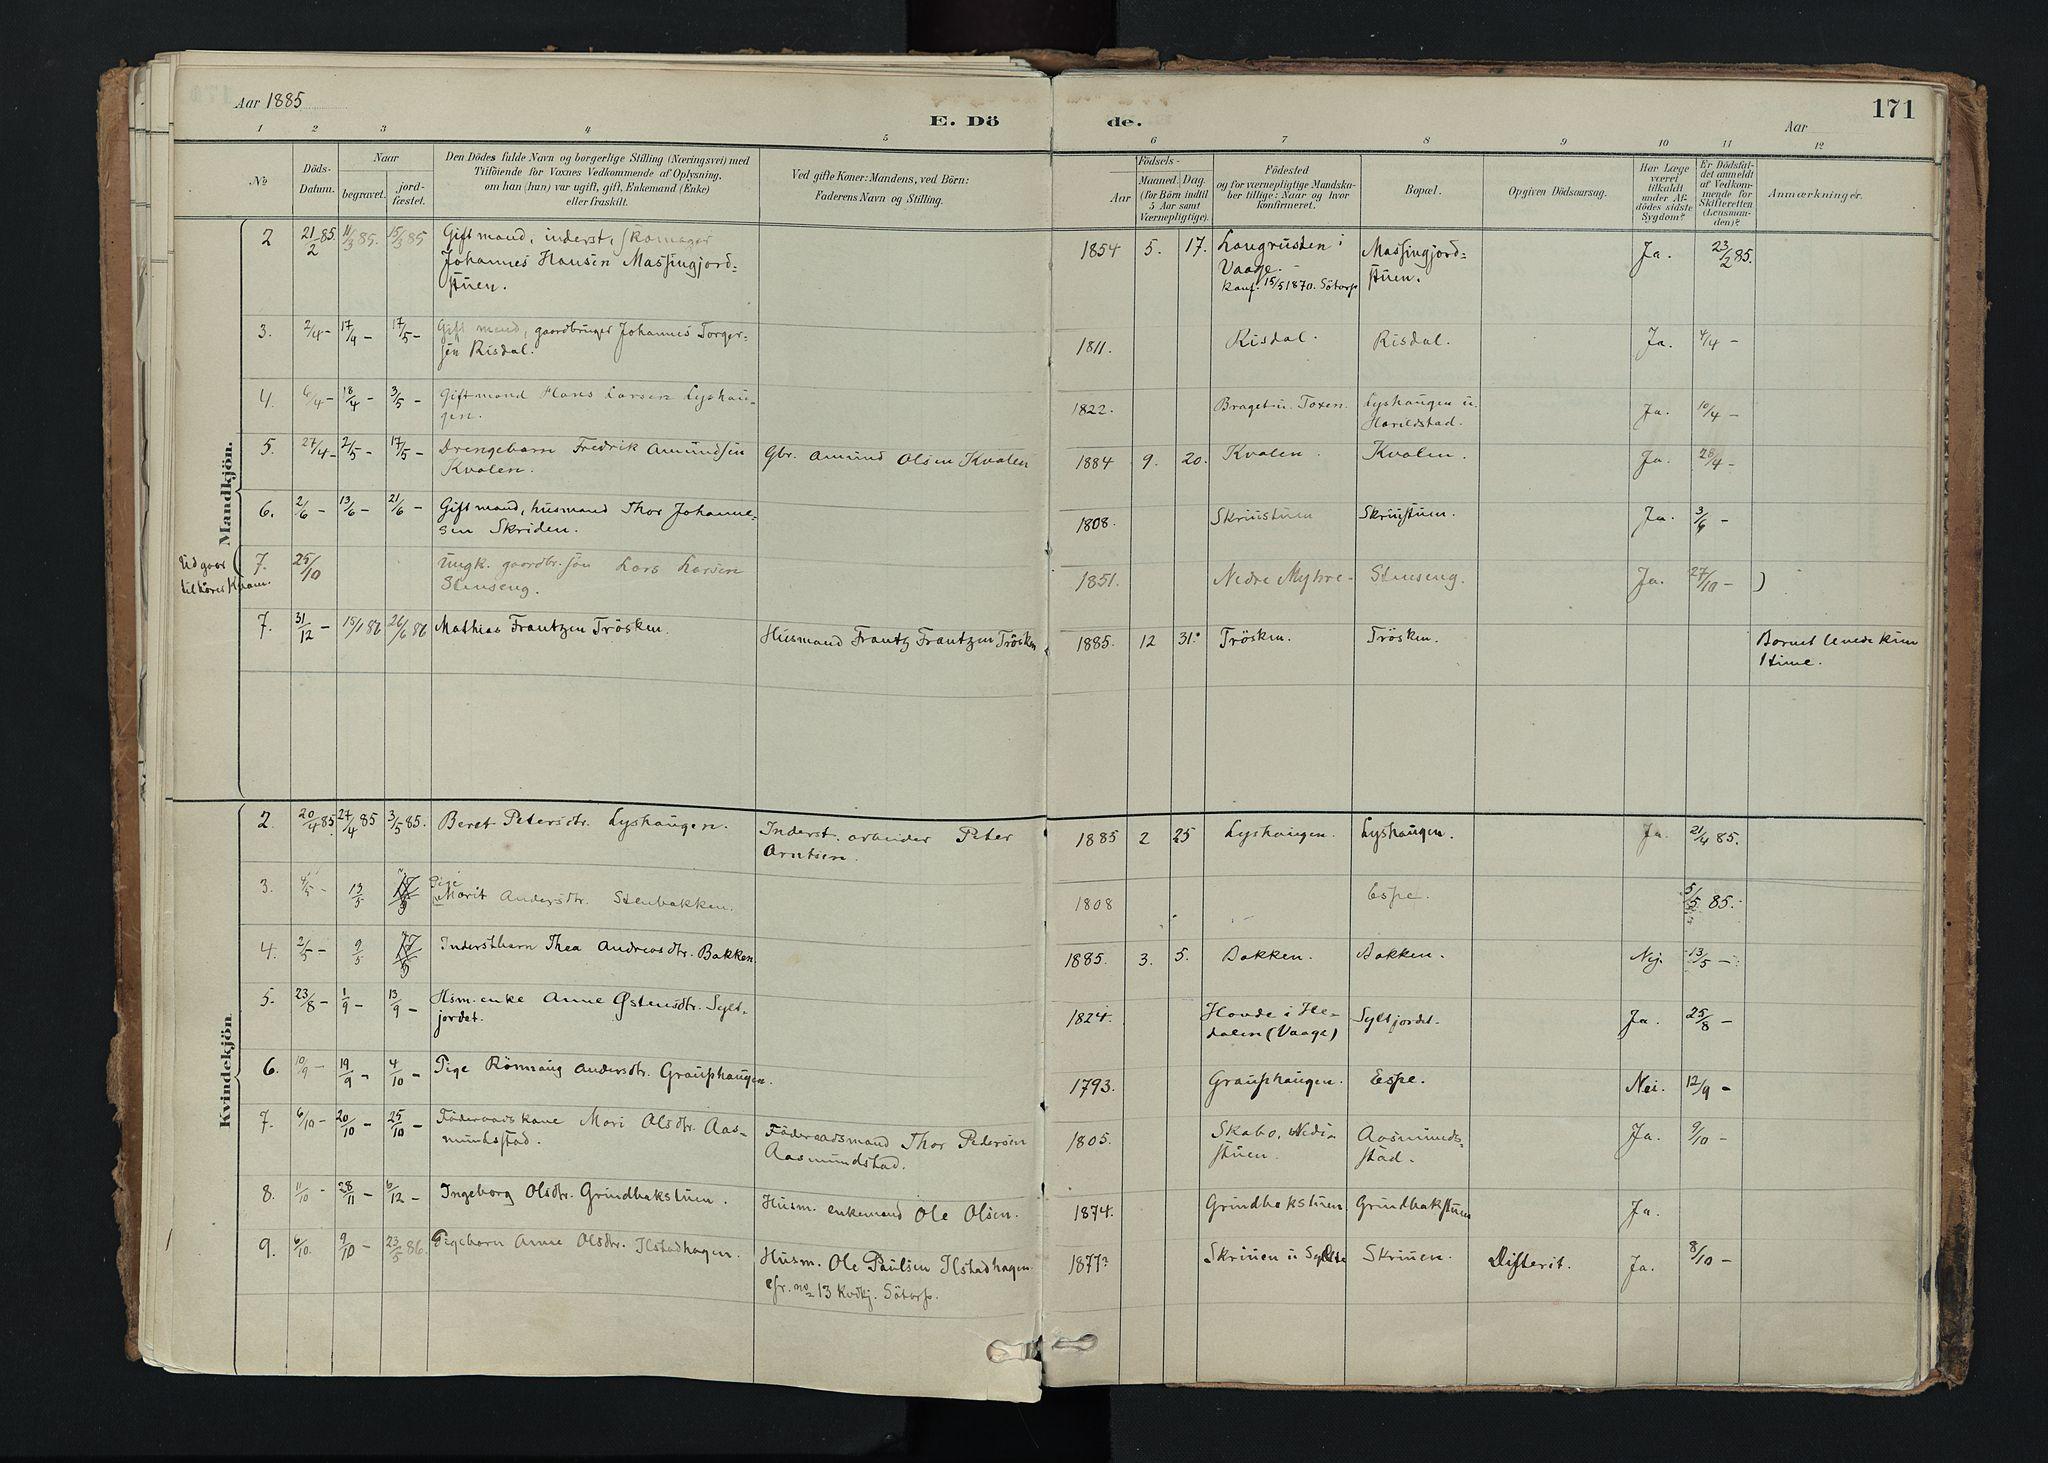 SAH, Nord-Fron prestekontor, Ministerialbok nr. 5, 1884-1914, s. 171